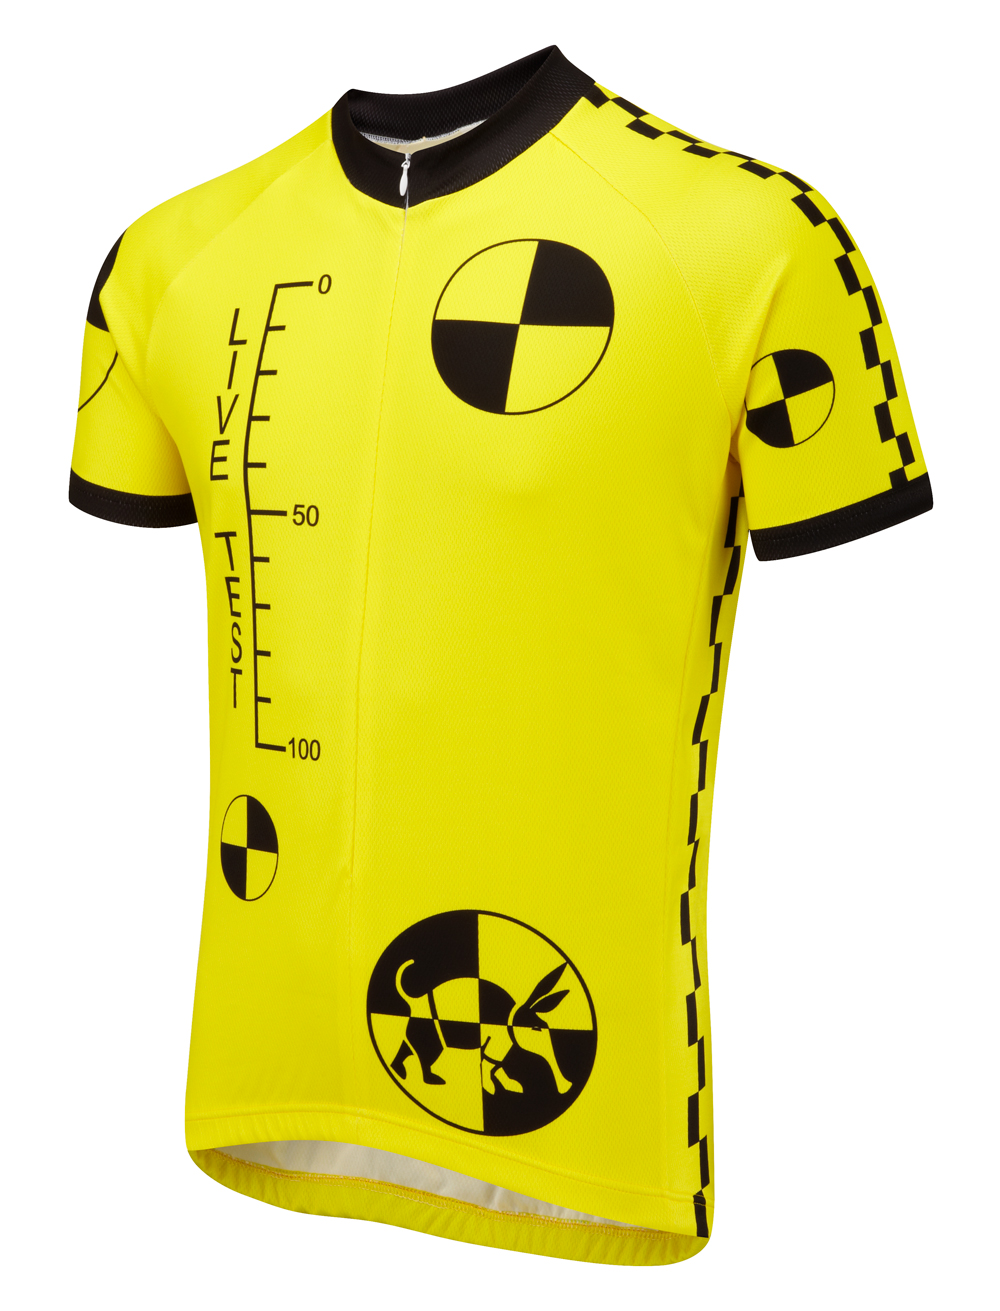 Test Dummy Road Cycling Jersey  Foskacom